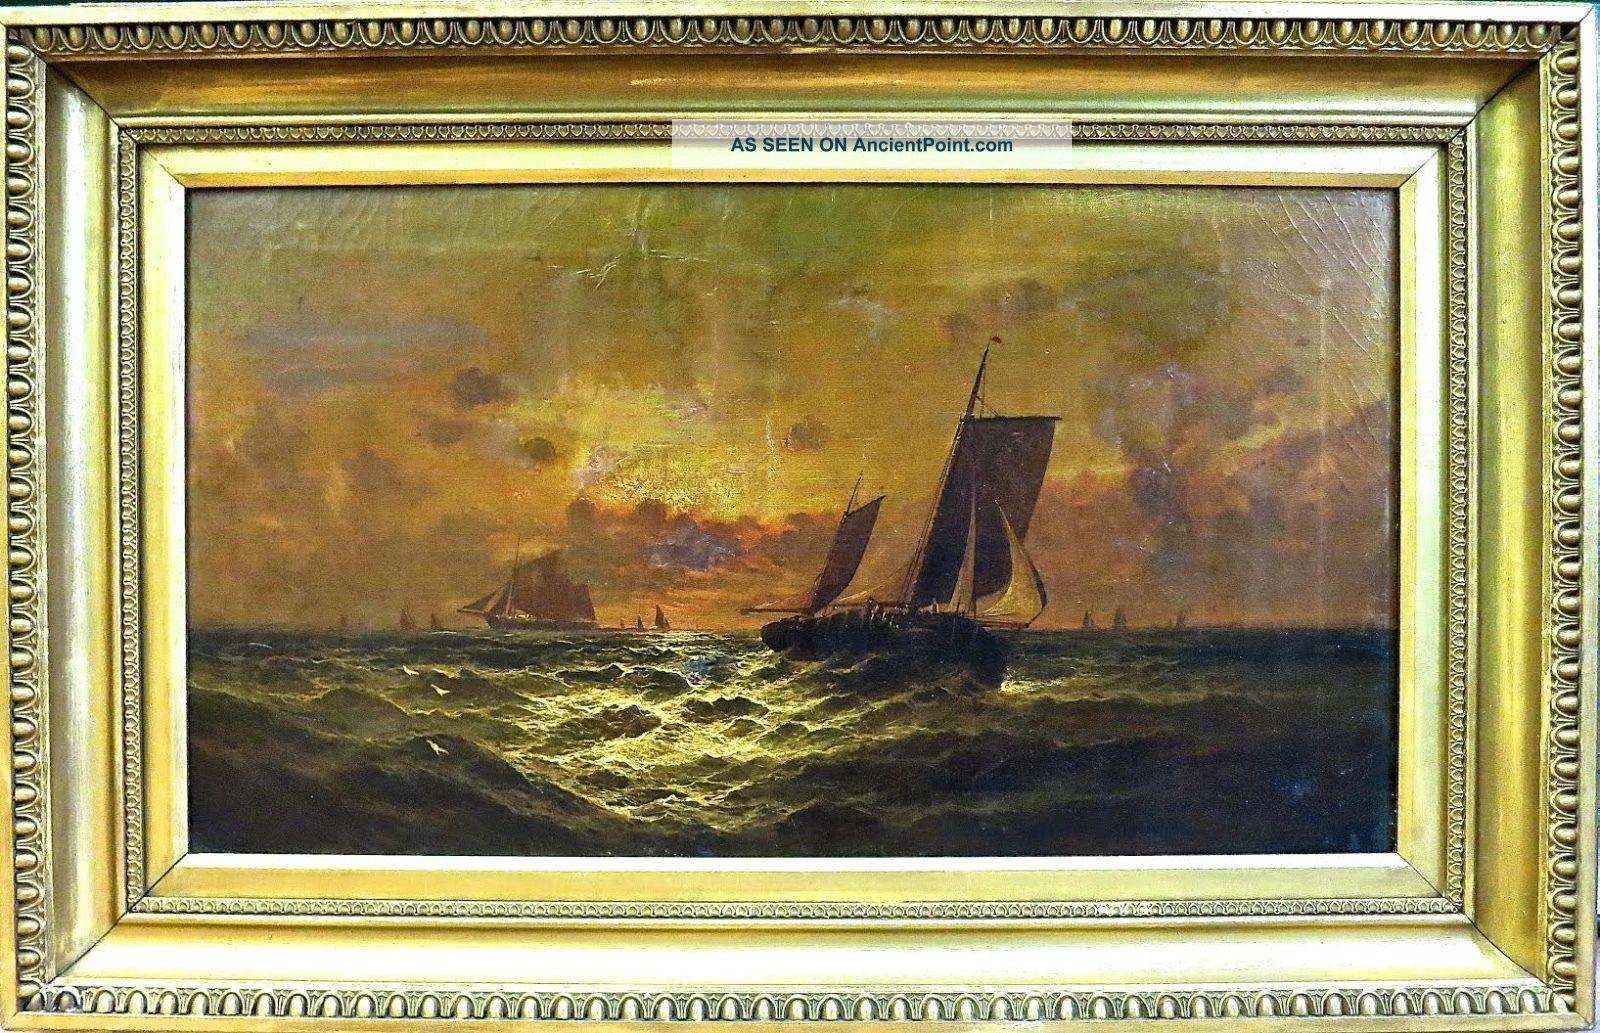 Sidney Yates Johnson (british 1890 - 1929) Ships At Sunset - Signed & Dated 1898 Other Maritime Antiques photo